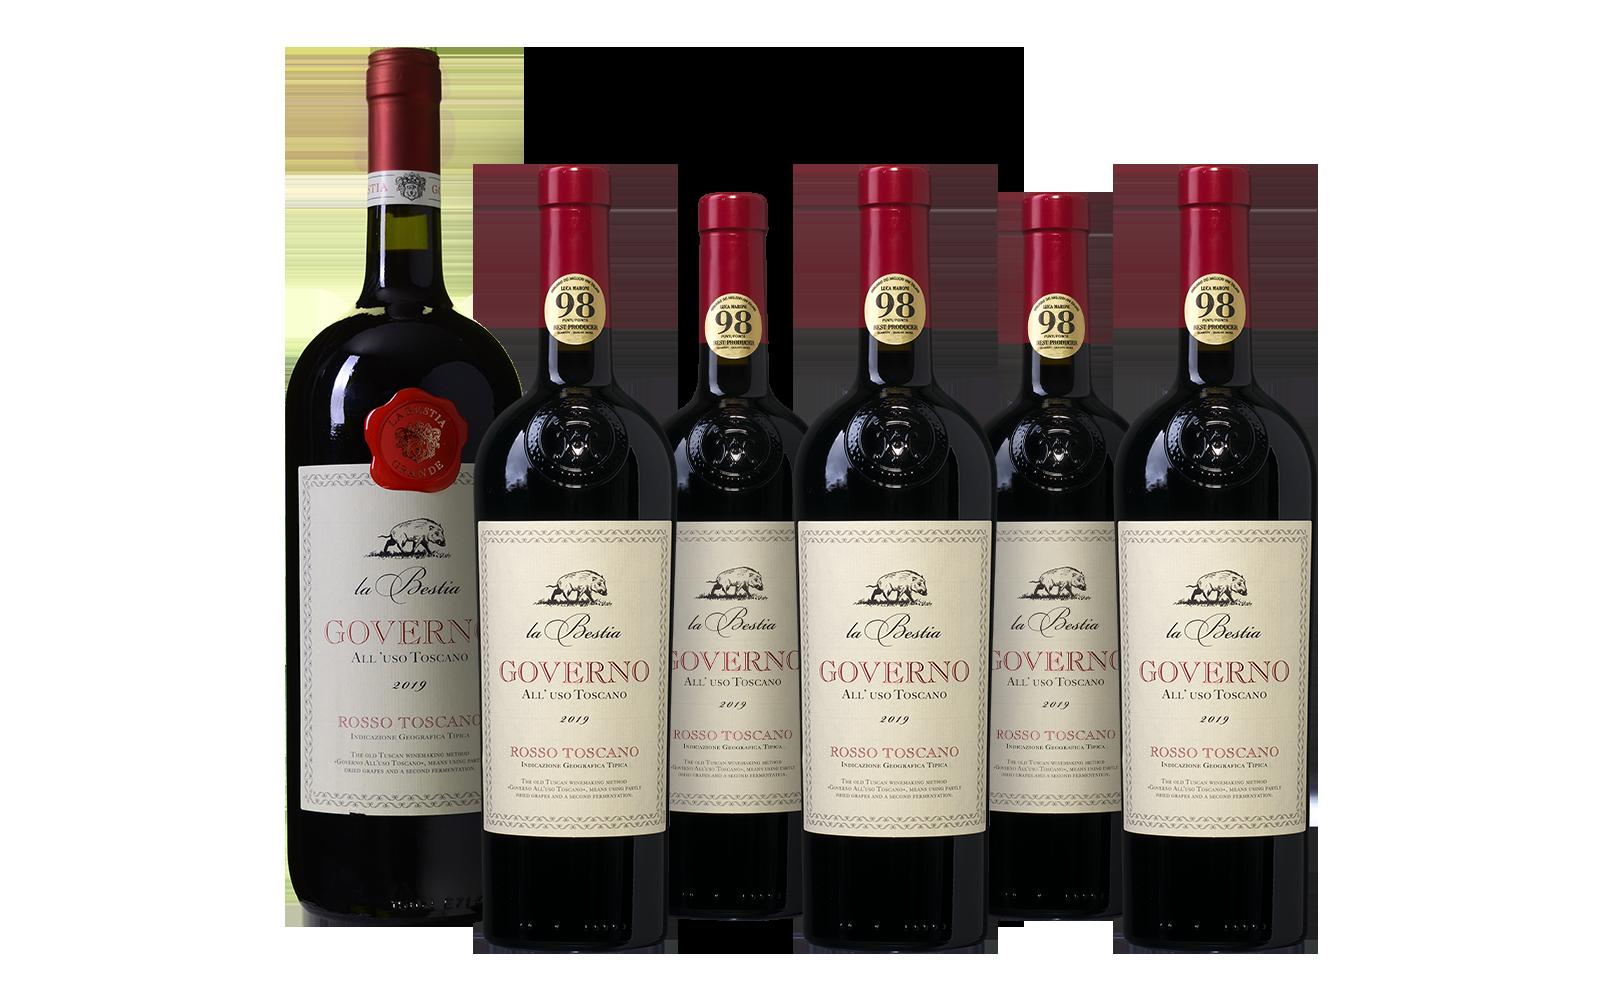 La Bestia Wijnpakket